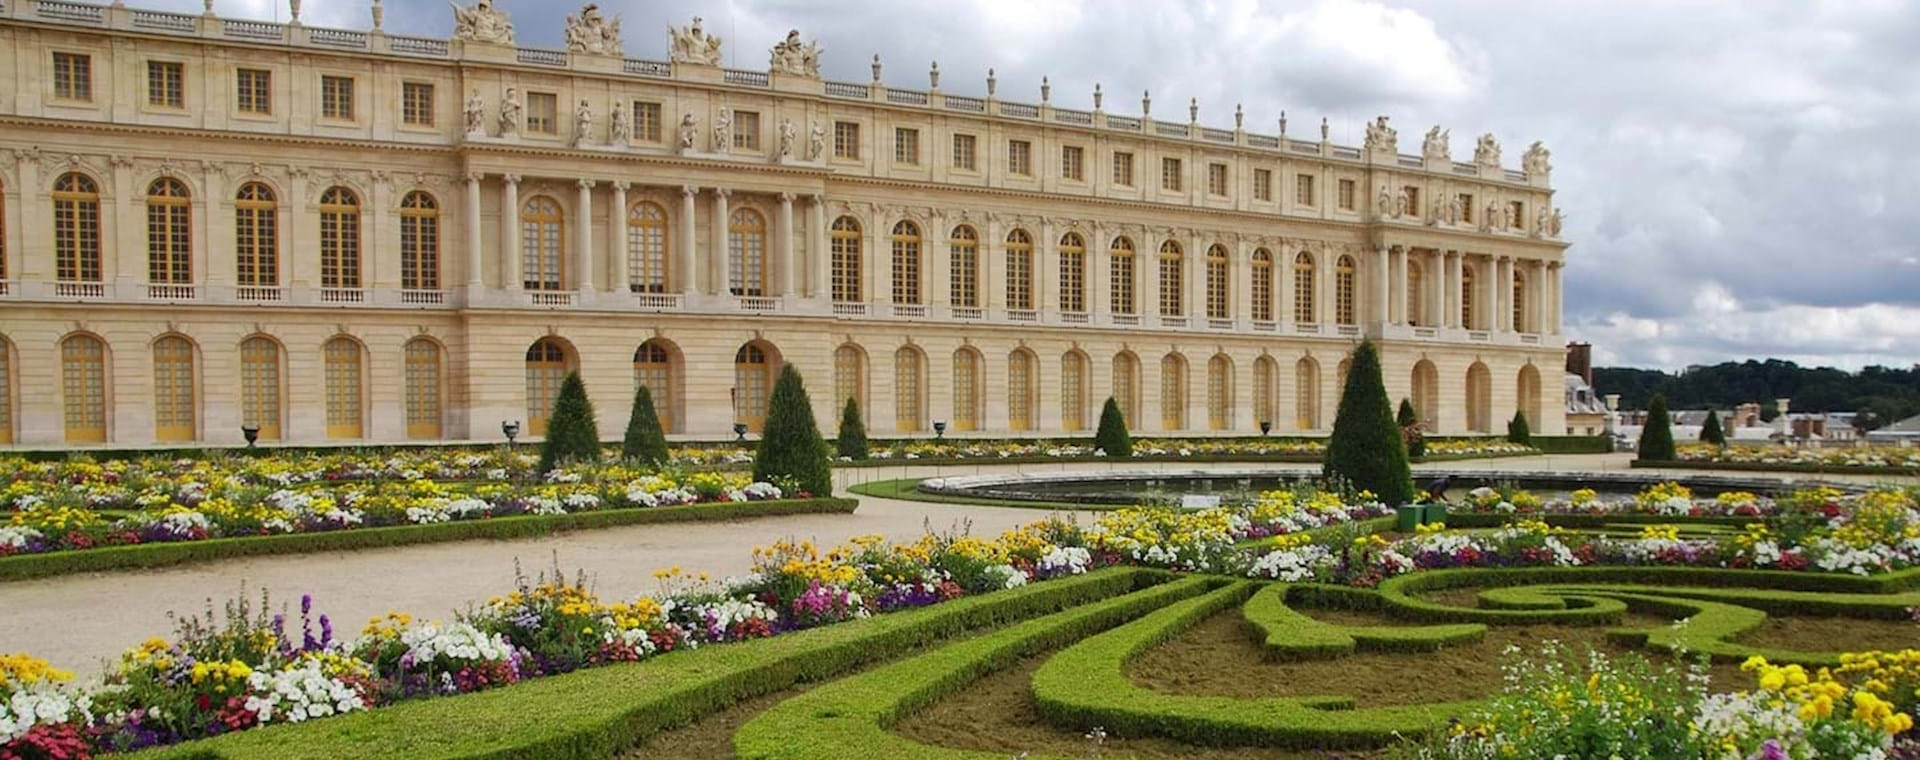 Versailles Palace & Gardens Tour from Versailles